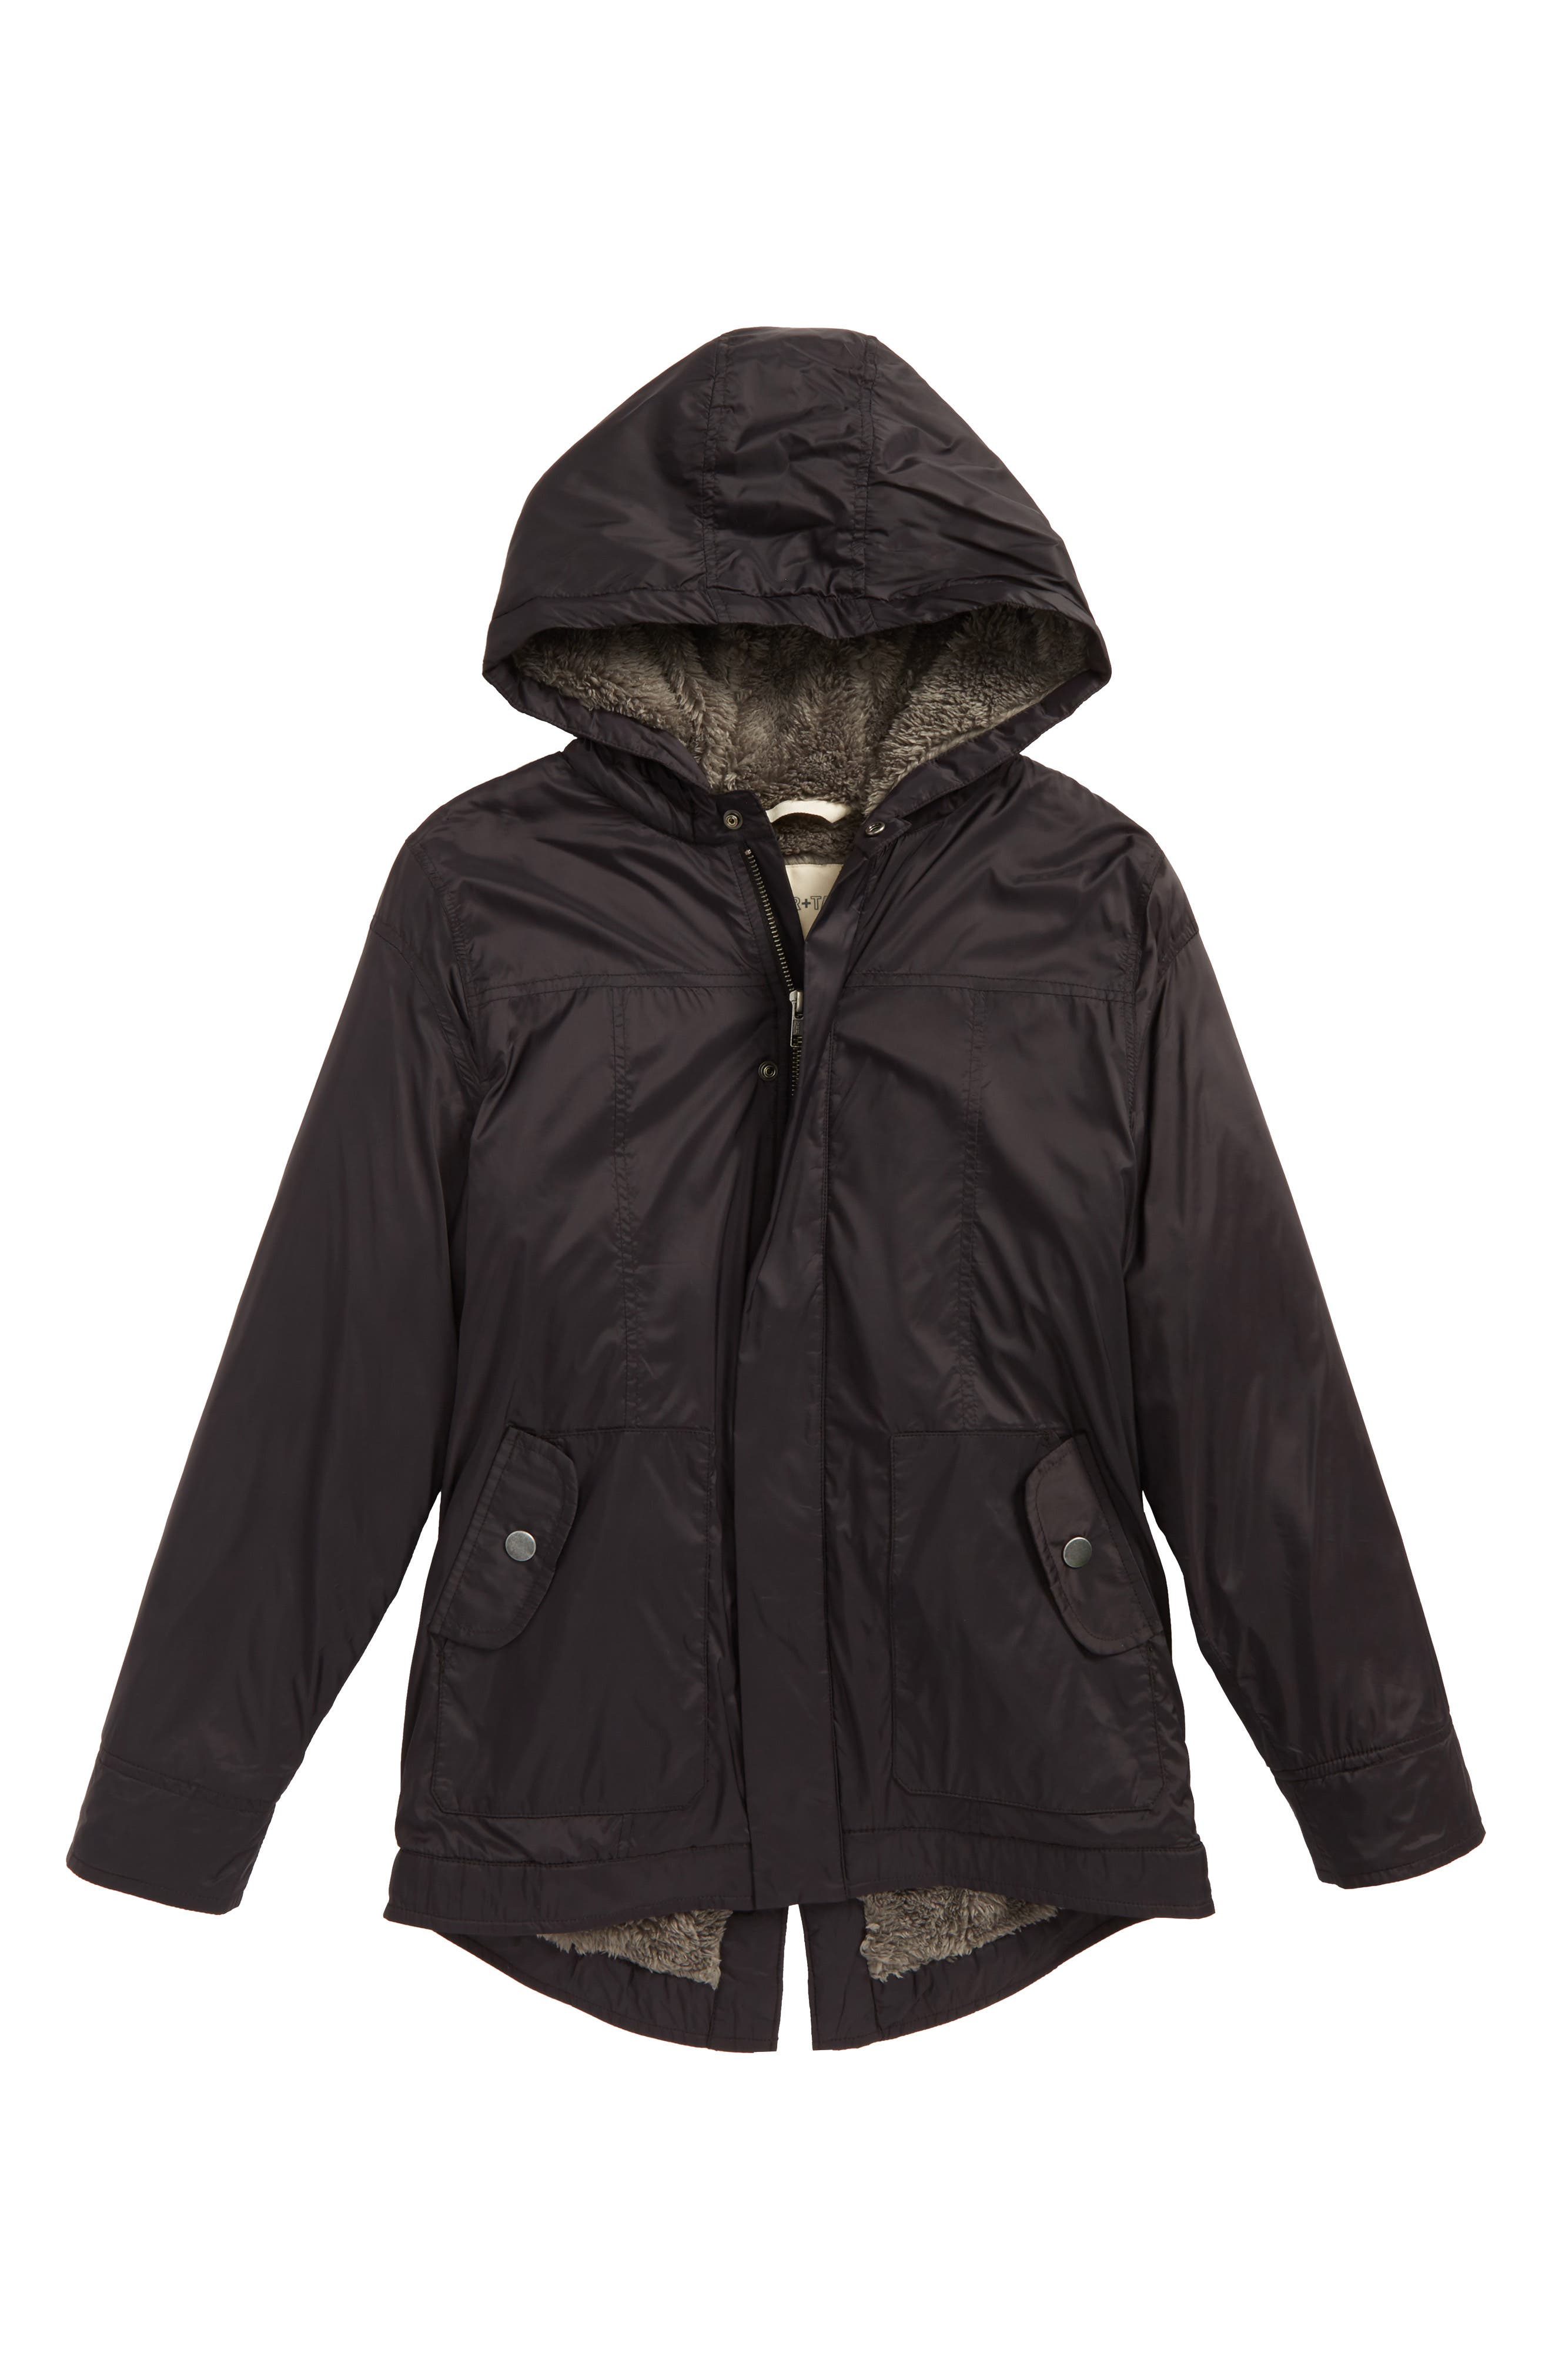 Main Image - Tucker + Tate Water Resistant Nylon Hooded Jacket (Big Boys)